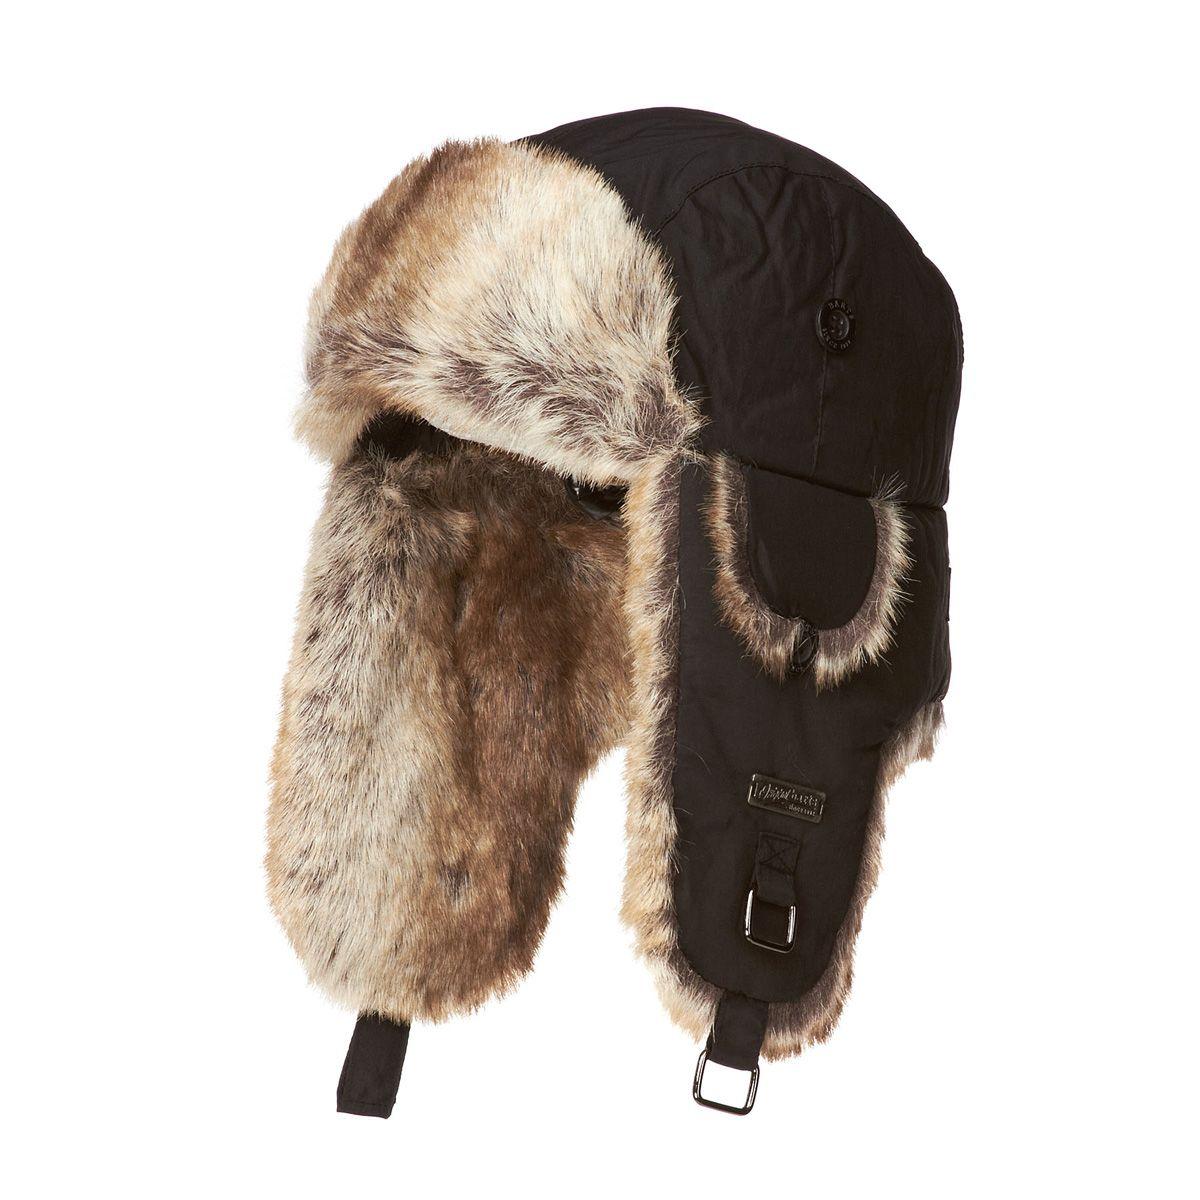 Barts Kamikaze Trapper Hat  c941c1a7299c